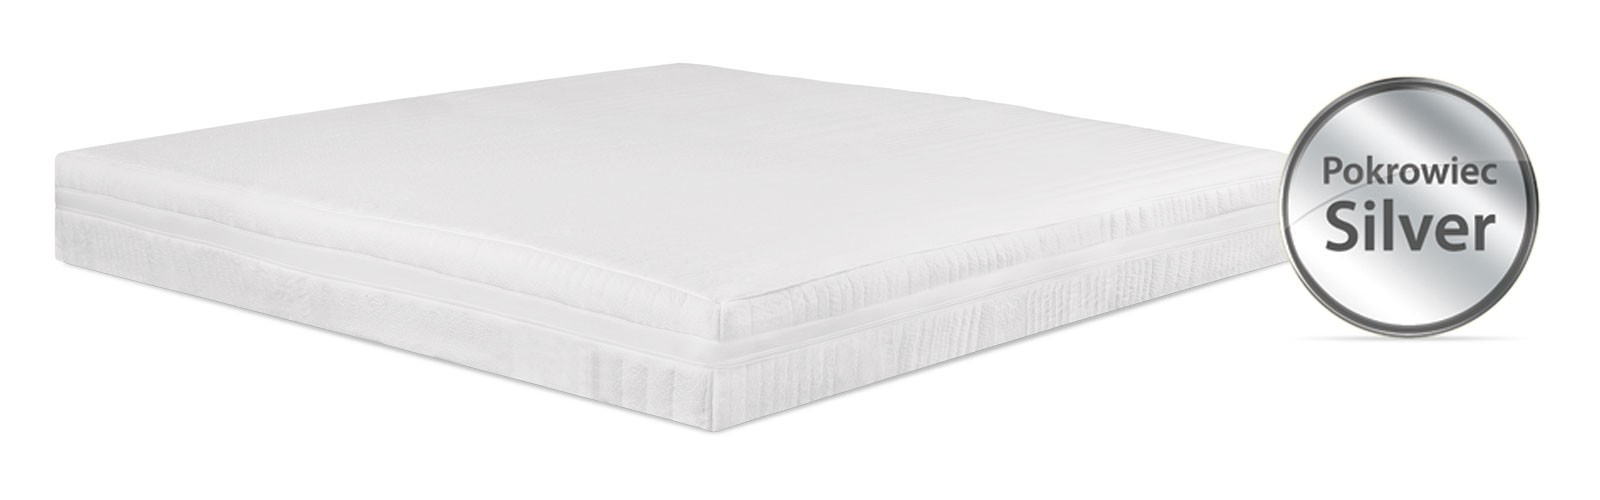 Materac sprężynowy Comfort Standard